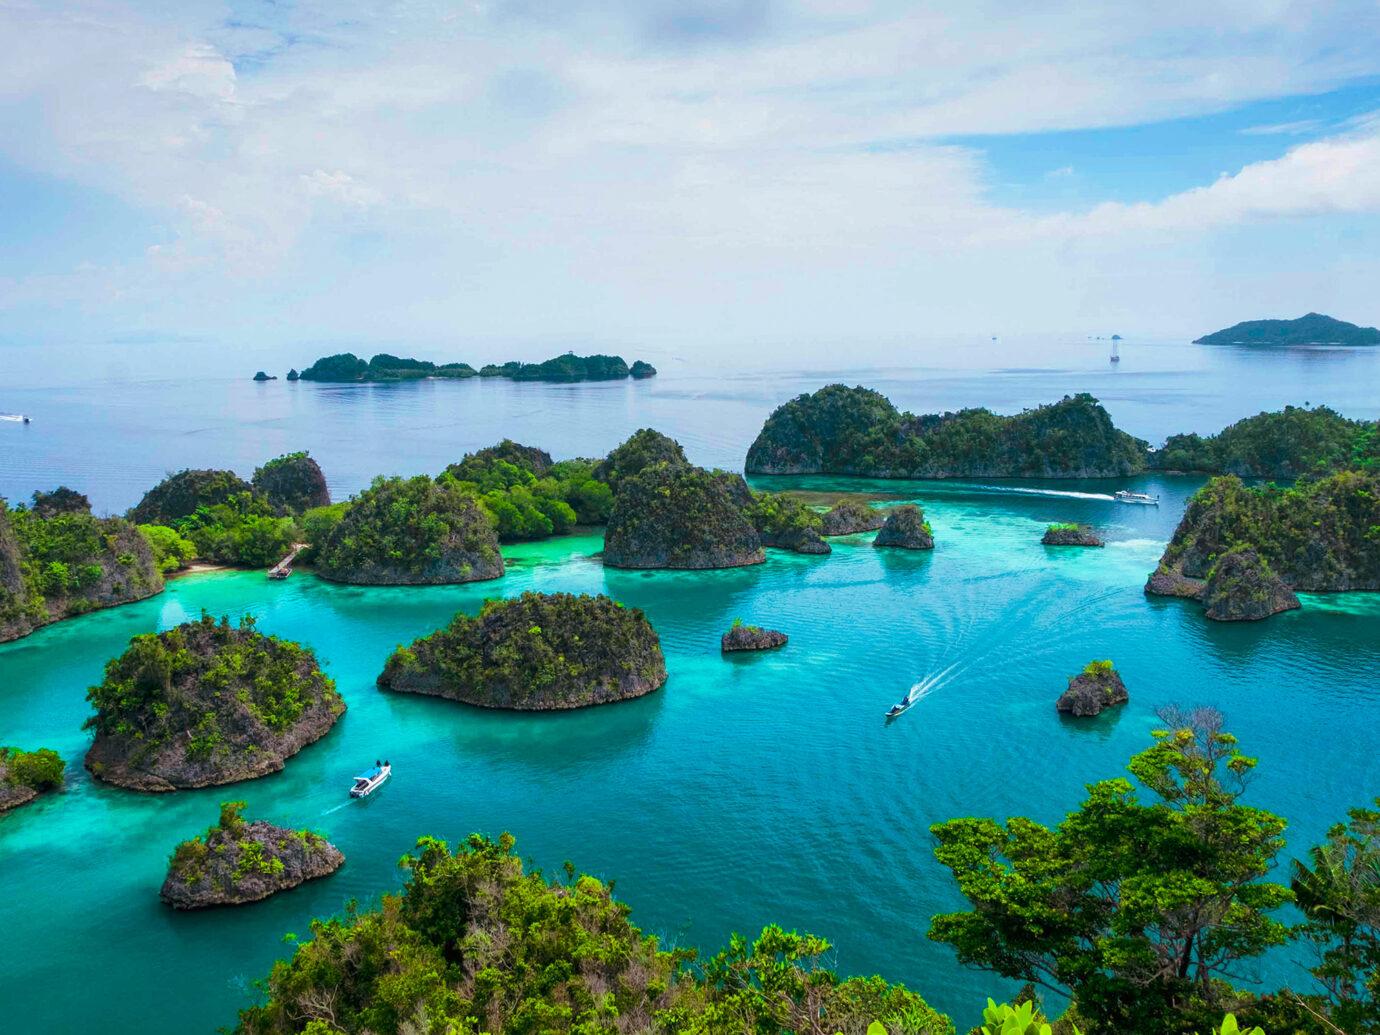 Marvelous view of Raja Ampat island, Indonesia